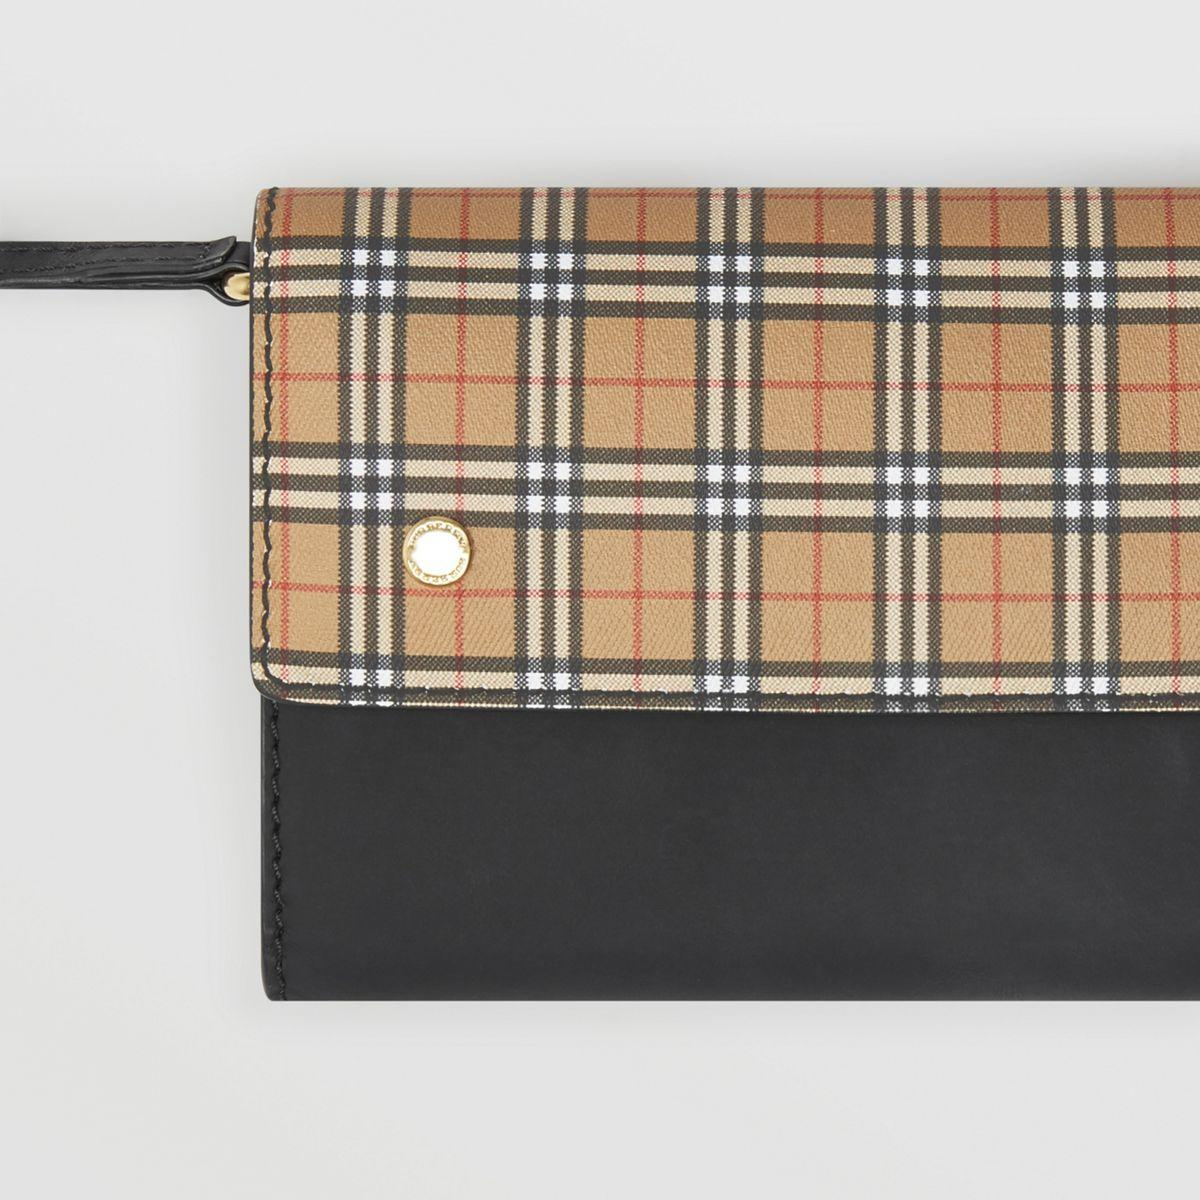 a4fa7d4a8e72 Burberry - Multicolor Small Scale Check Wallet With Detachable Strap -  Lyst. View fullscreen